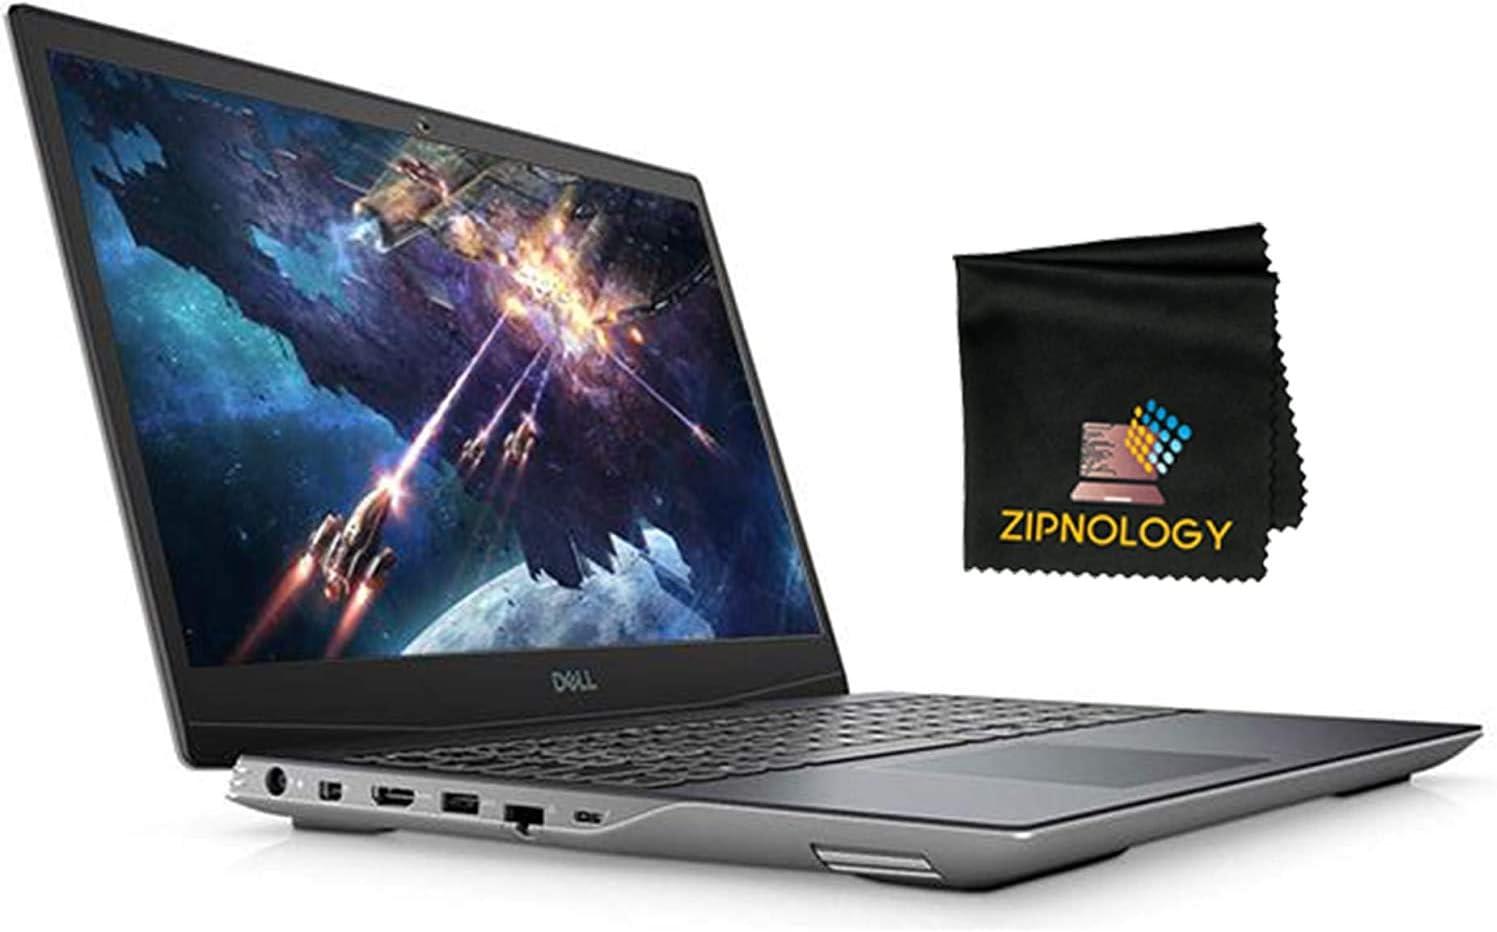 "Dell Inspiron 15 3502 - 15.6"" HD Display with Webcam - Intel Celeron N4020 - 128GB SSD - 4GB DDR4 - Intel UHD Graphics - Windows 10 Home + Zipnology Screen Cleaning Cloth Bundle - New"